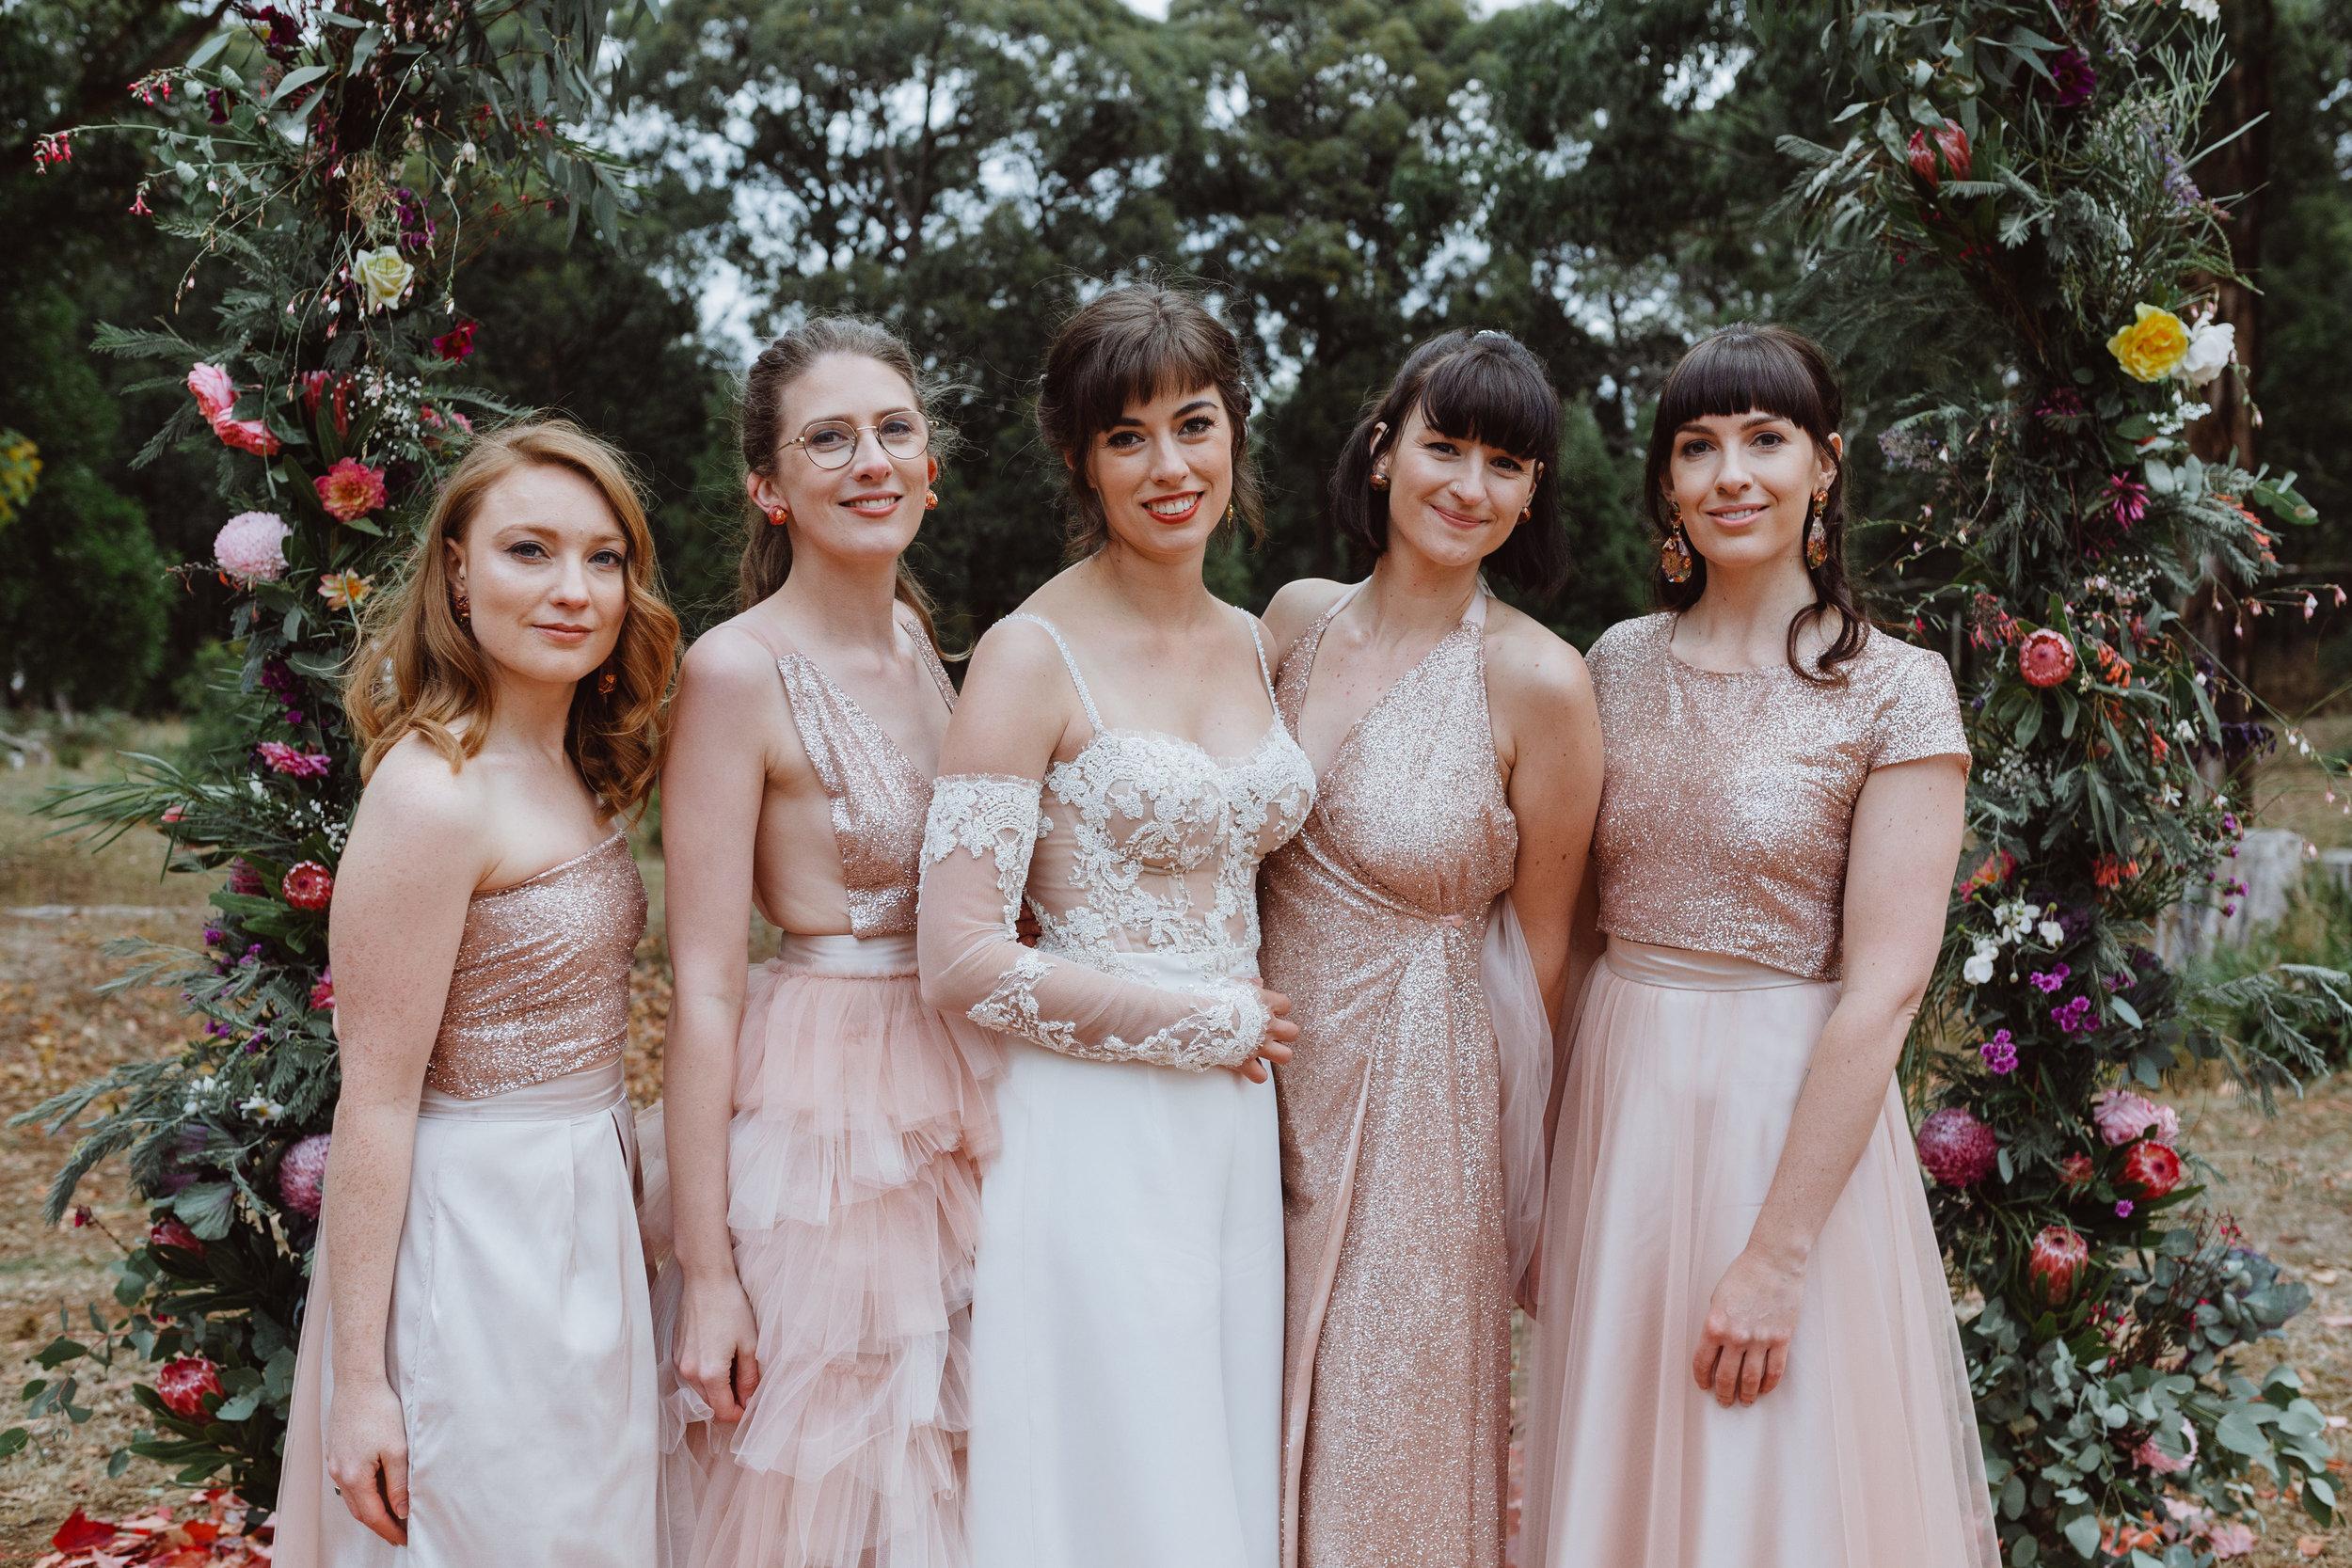 Wedding_Party-9.jpg